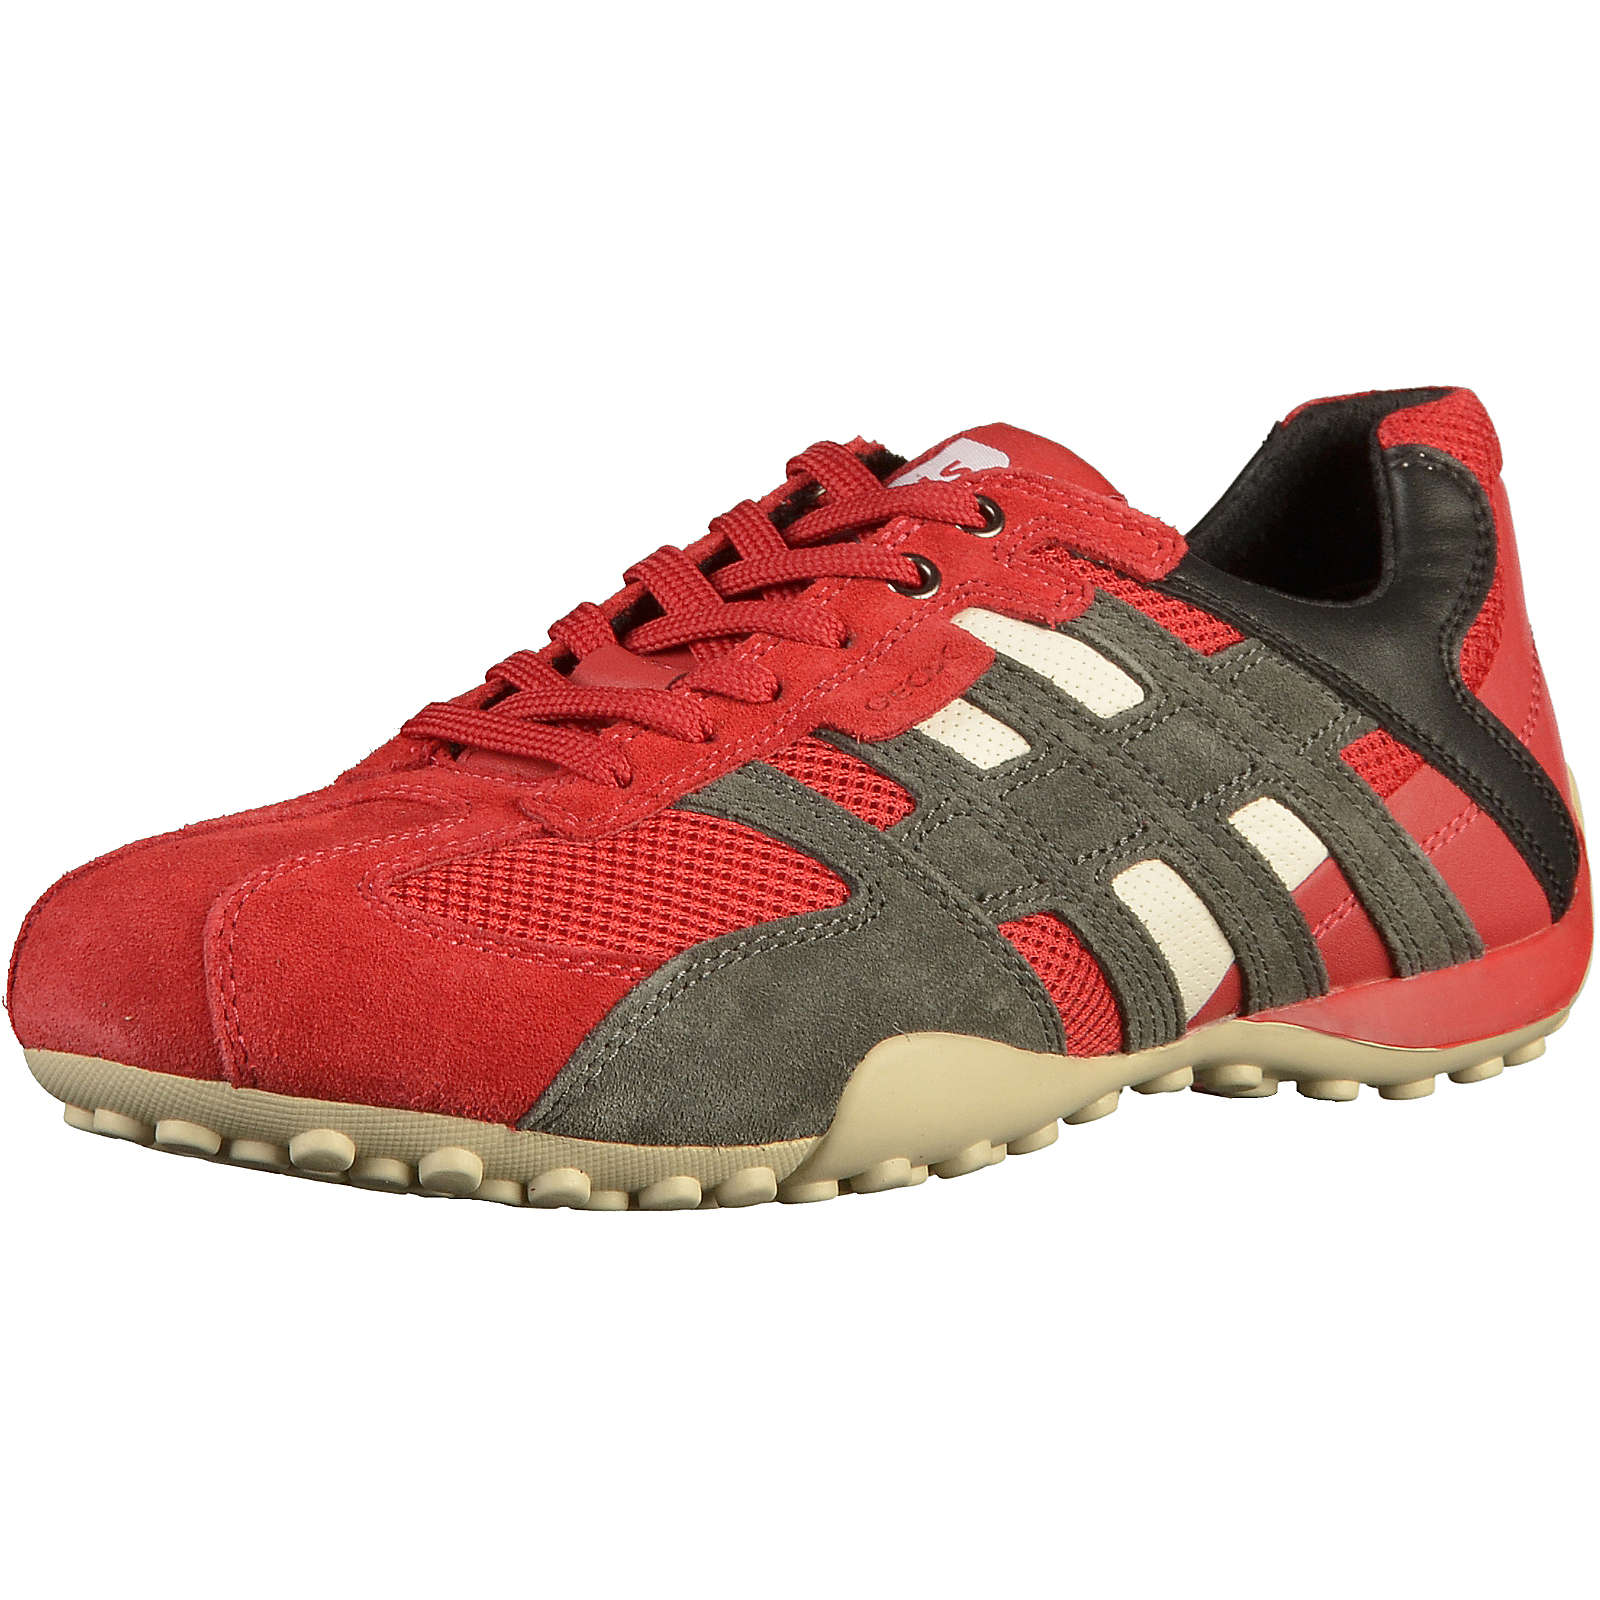 GEOX Sneaker Sneakers Low rot-kombi Herren Gr. 44